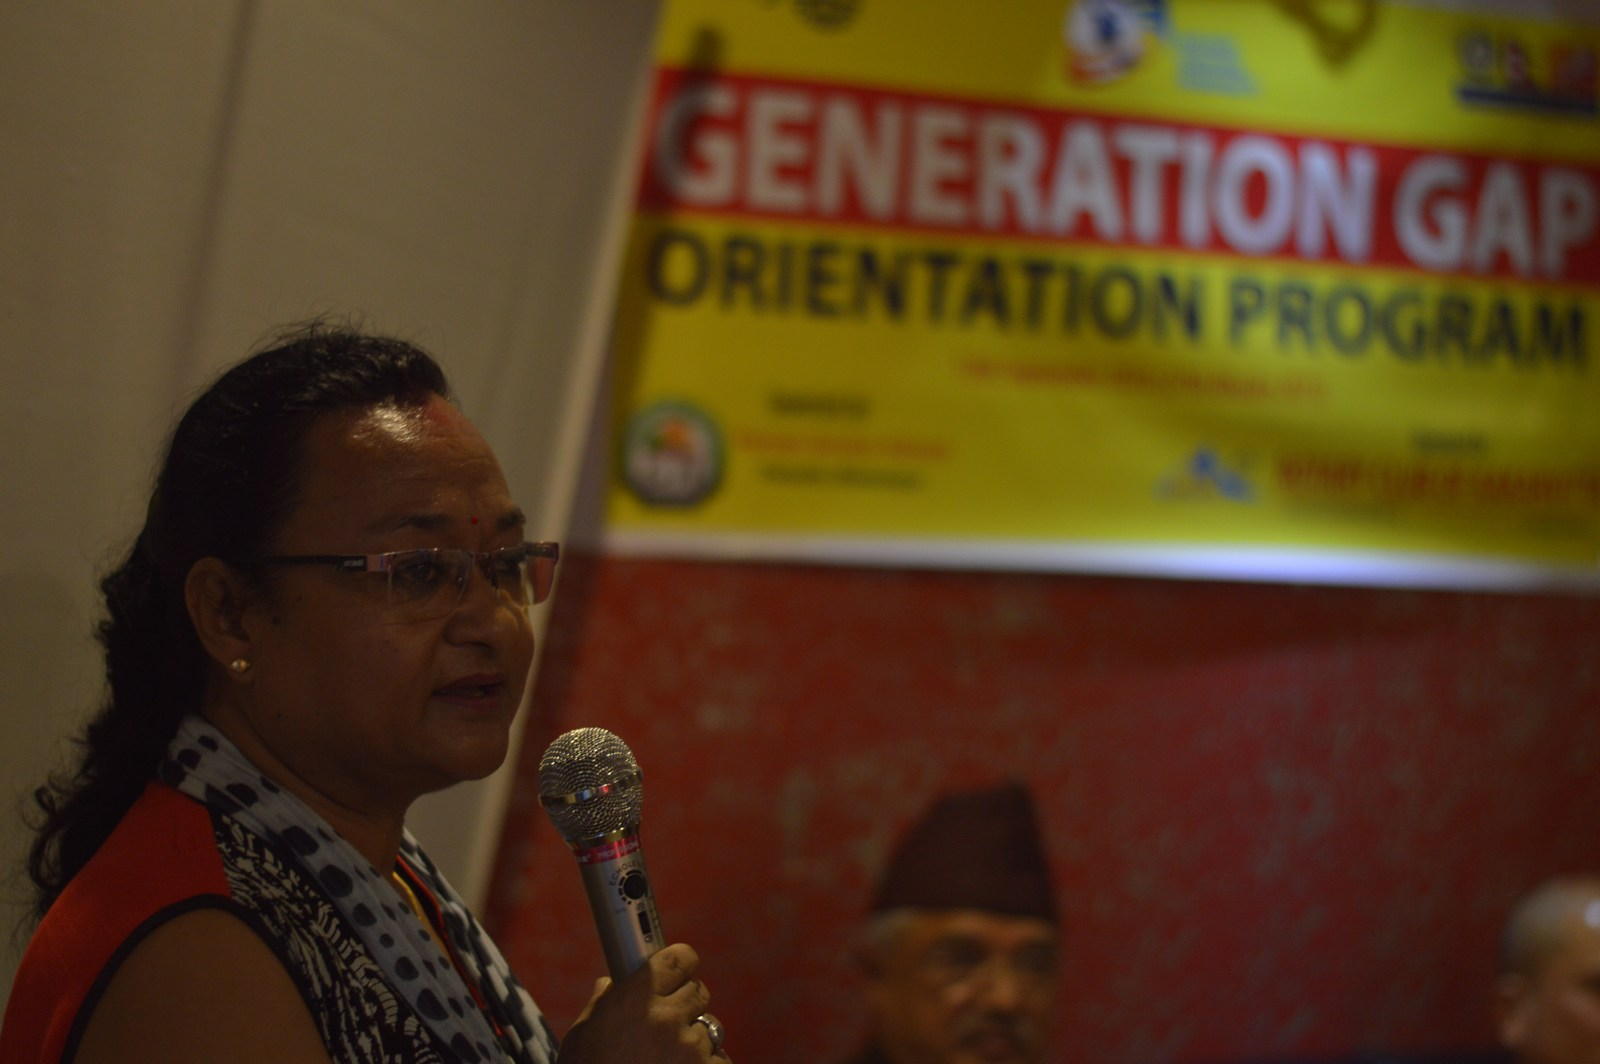 Generation-Gap-Orientation-Program-Rotary-Club-of-Kakarvitta-28